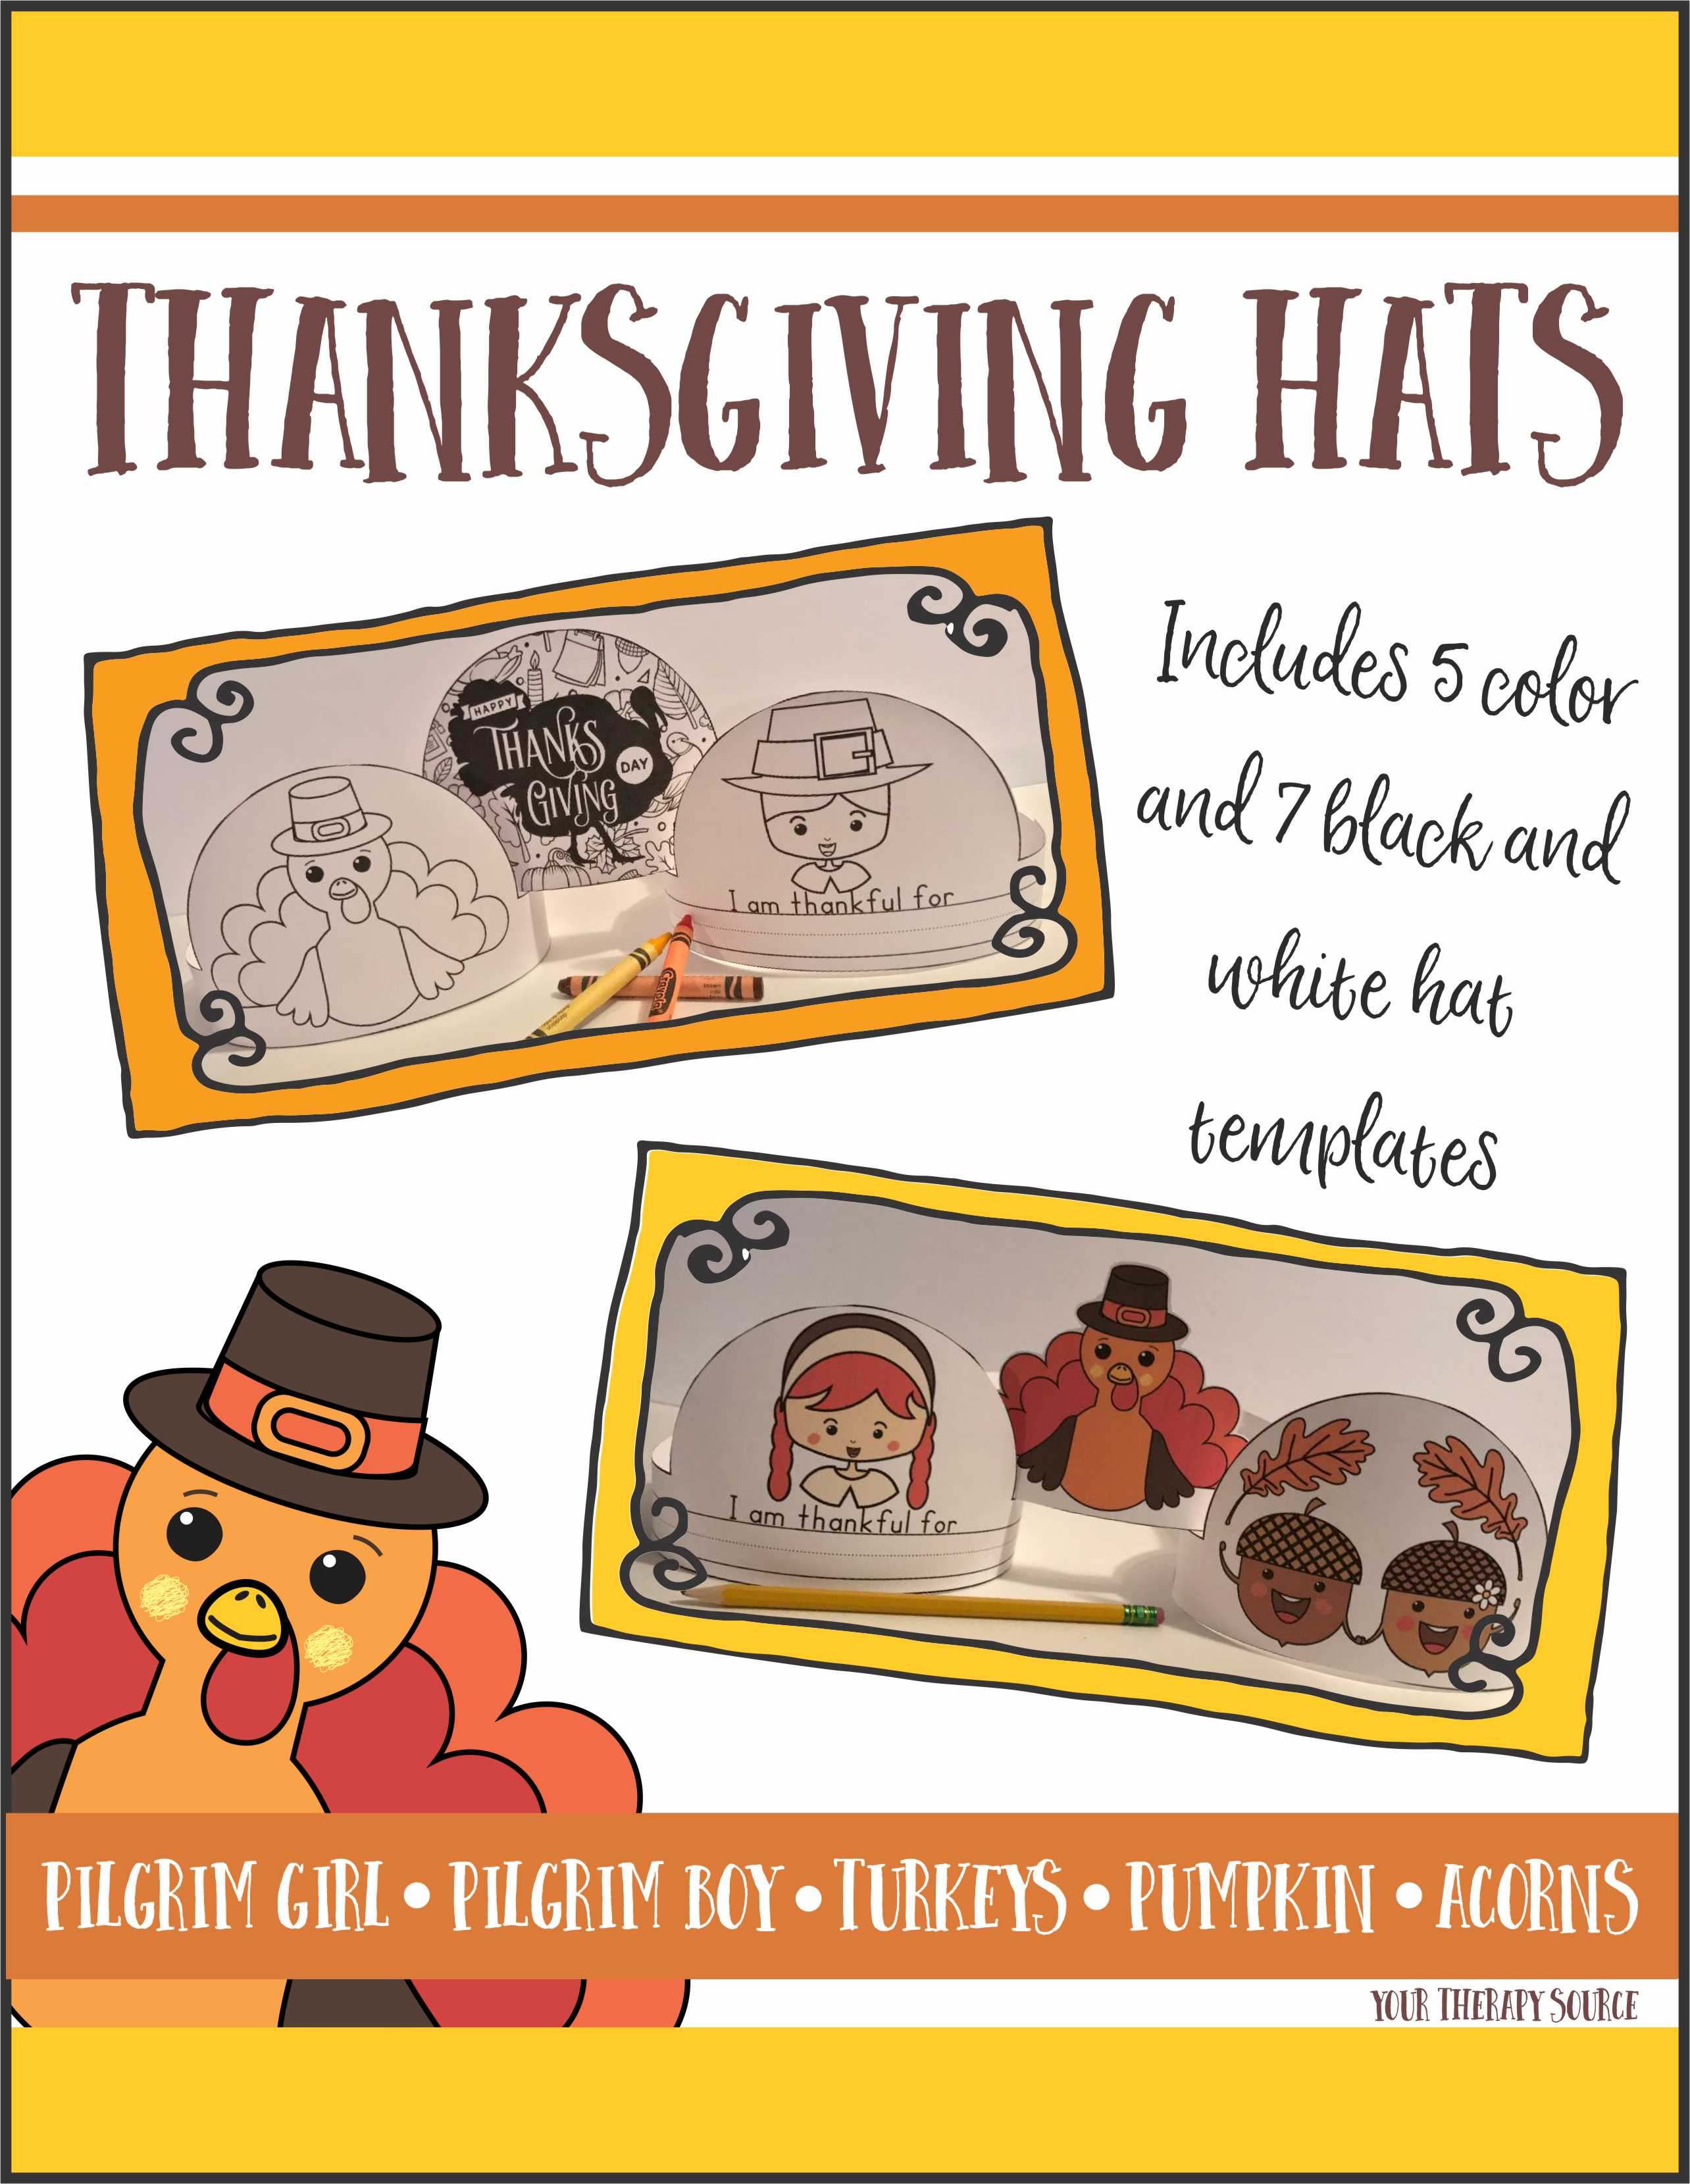 Thanksgiving Hats